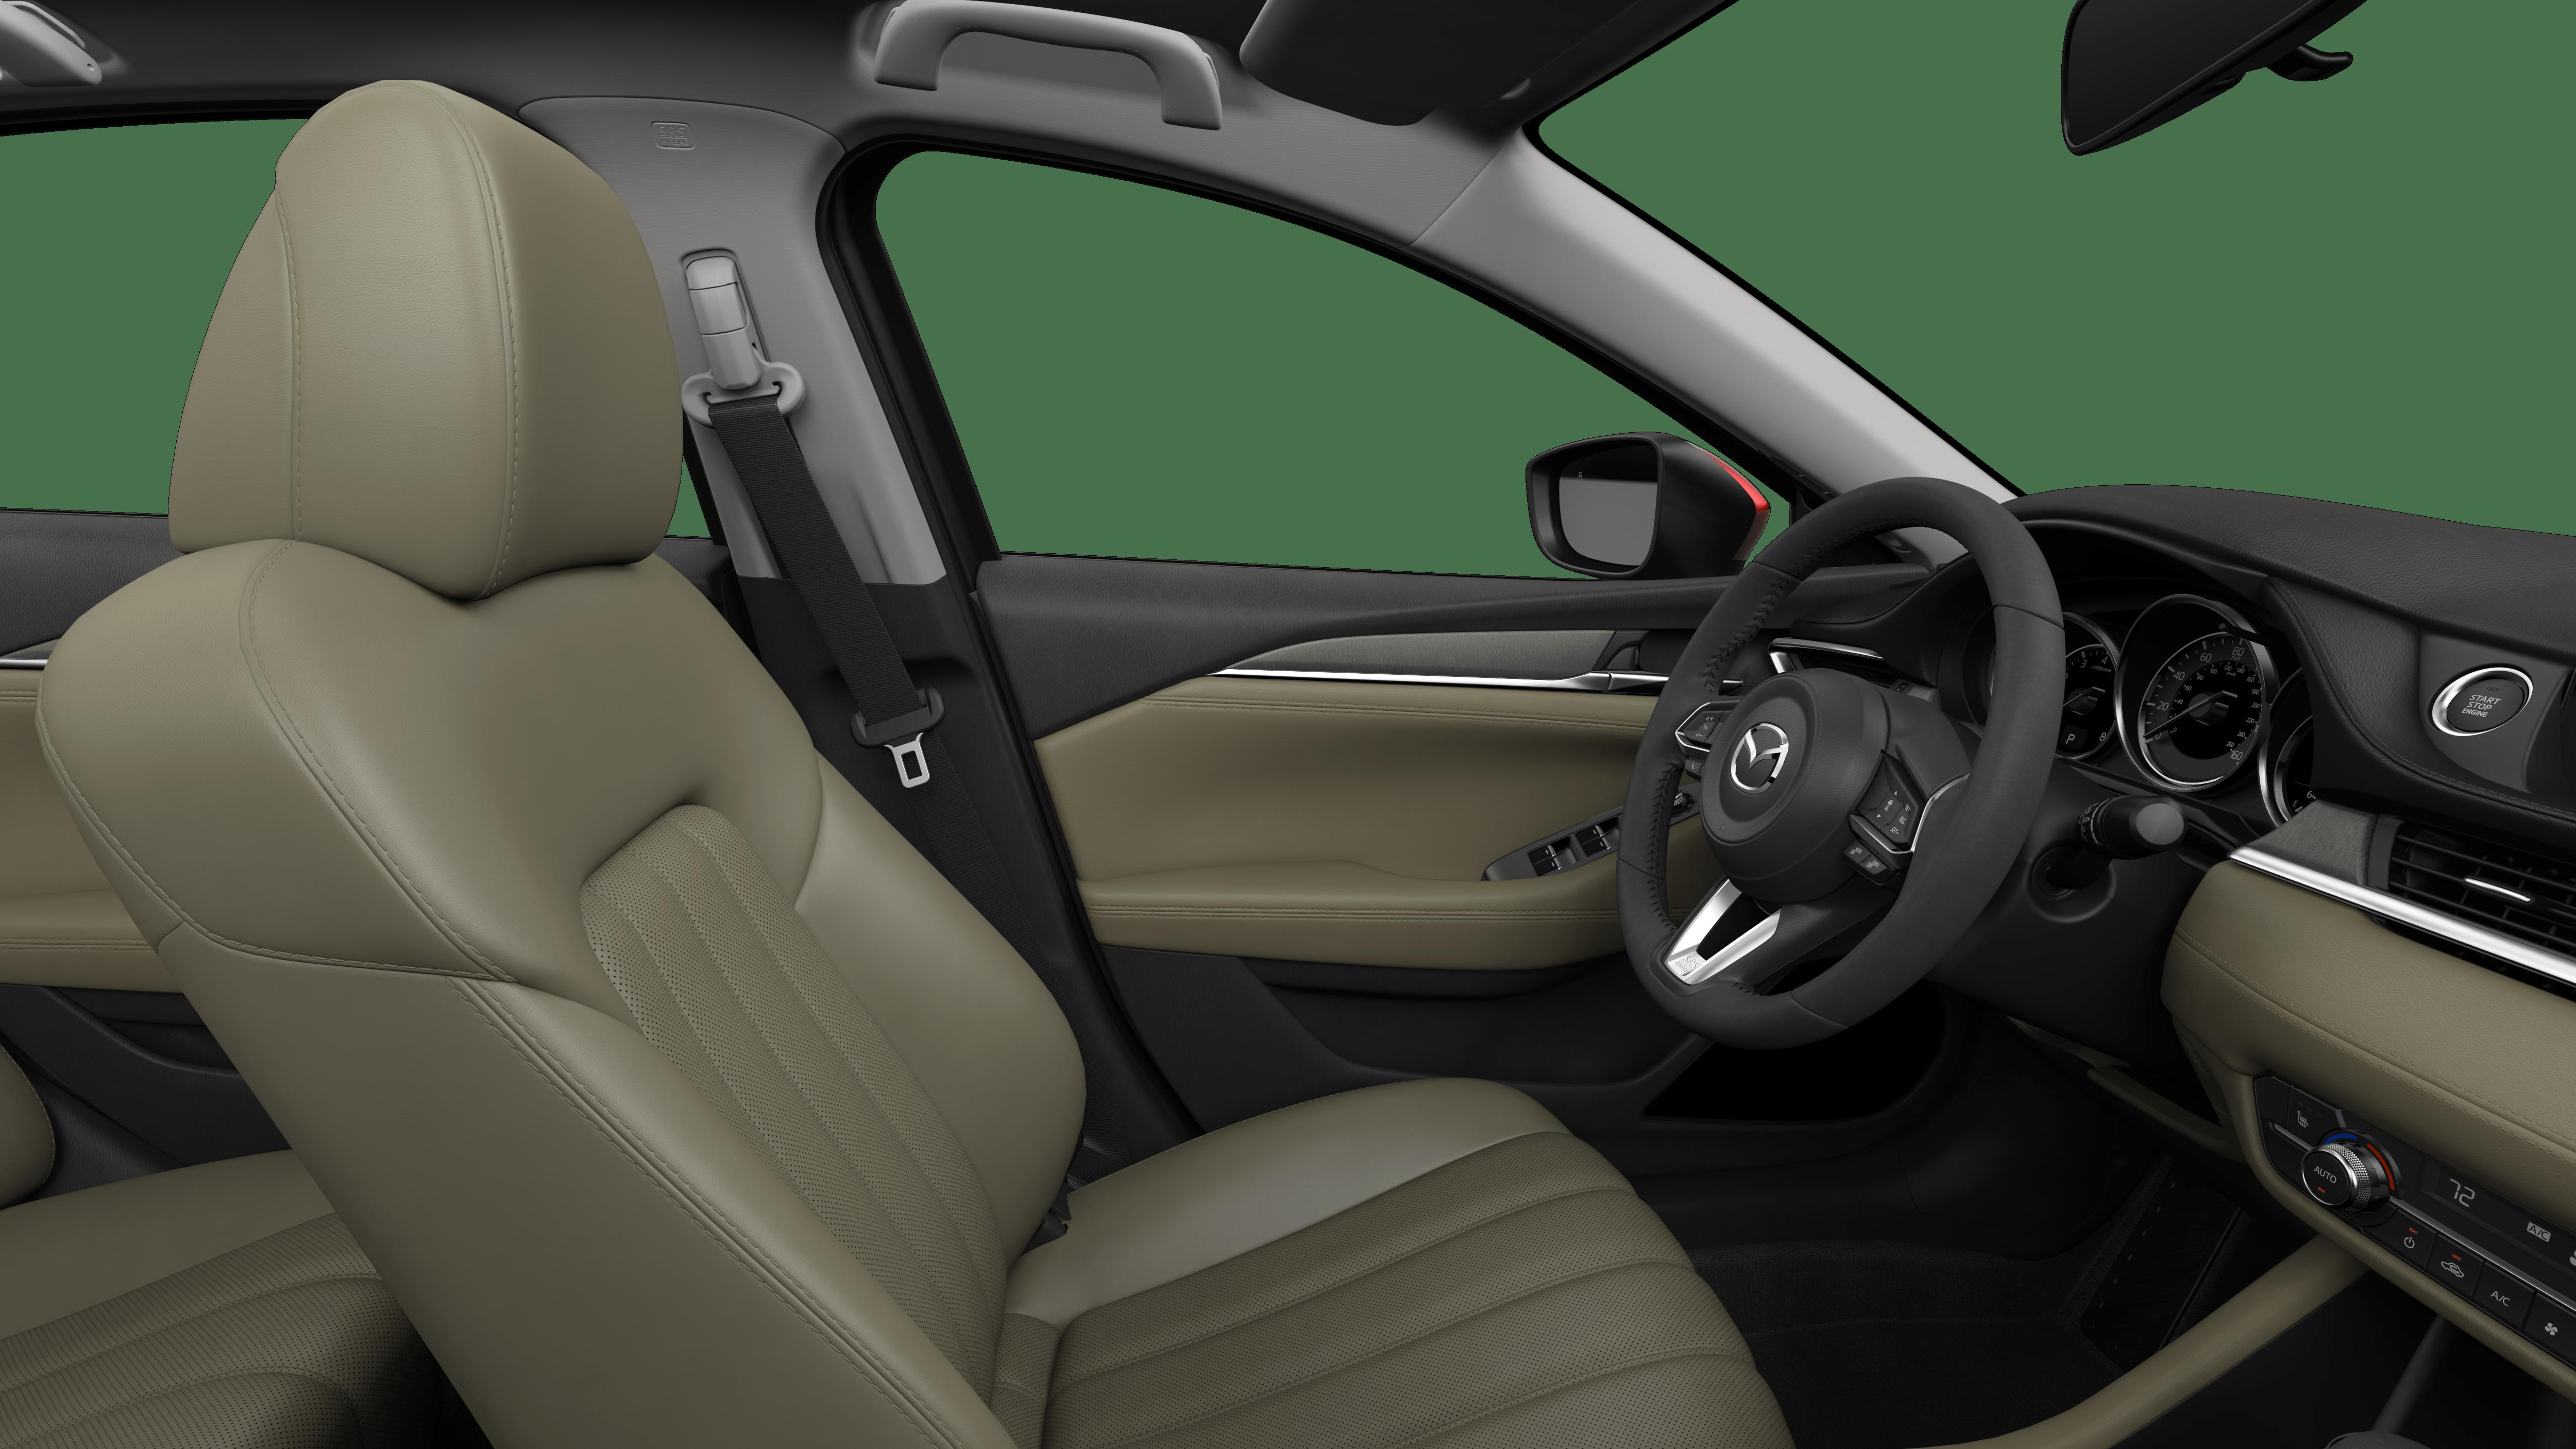 2018 Mazda6, Sand Cloth